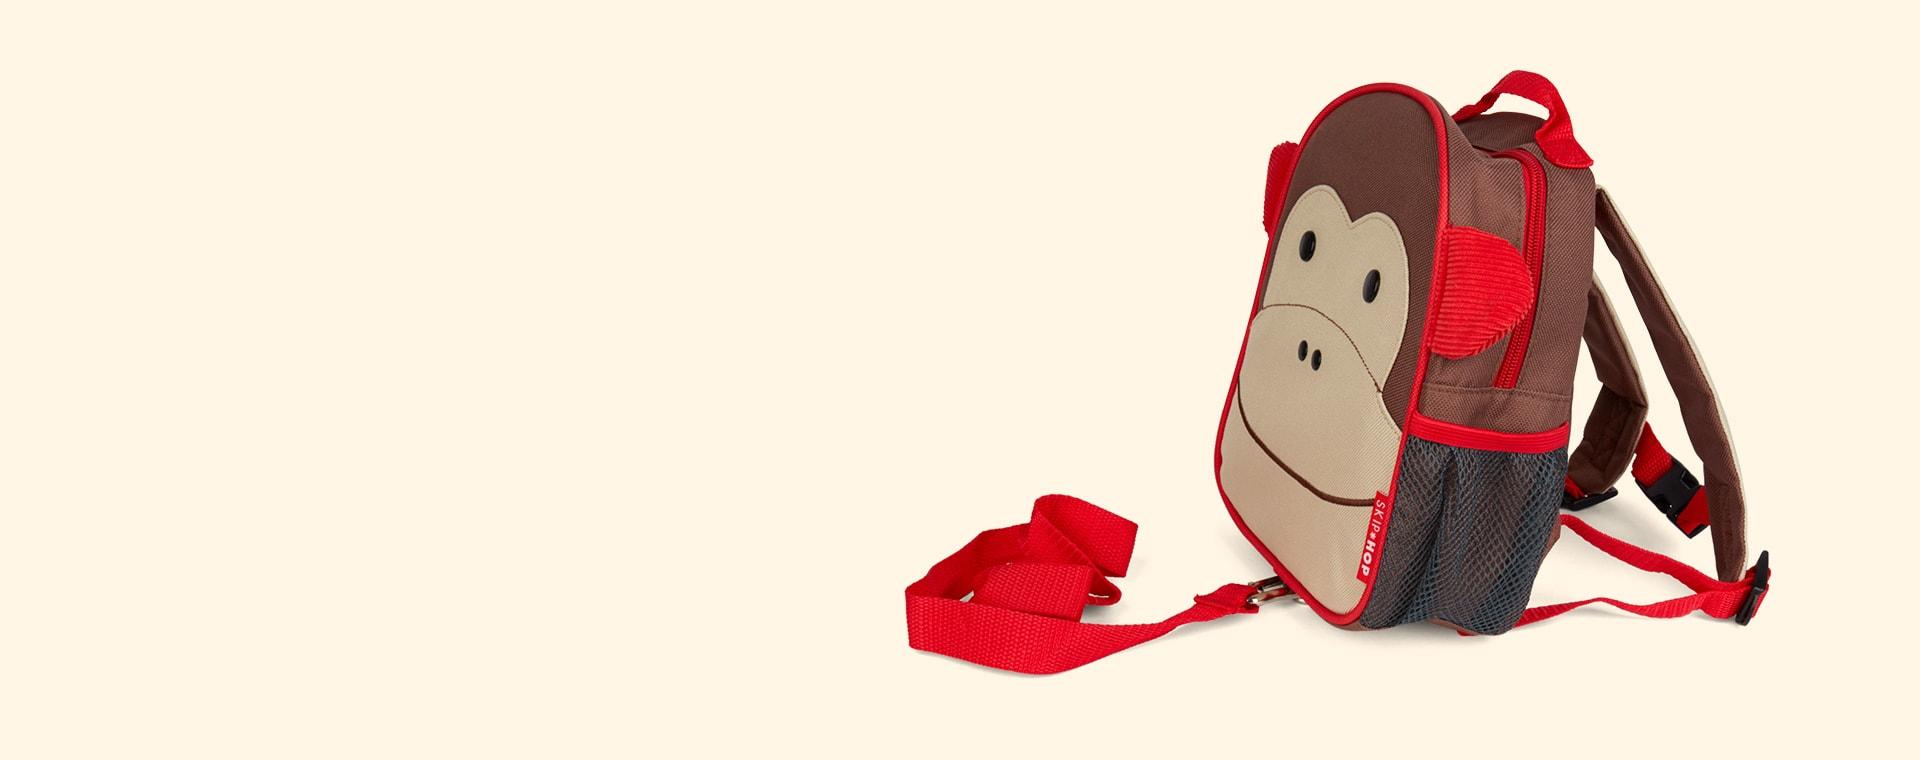 Monkey Skip Hop Zoolet Mini Backpack with Reins